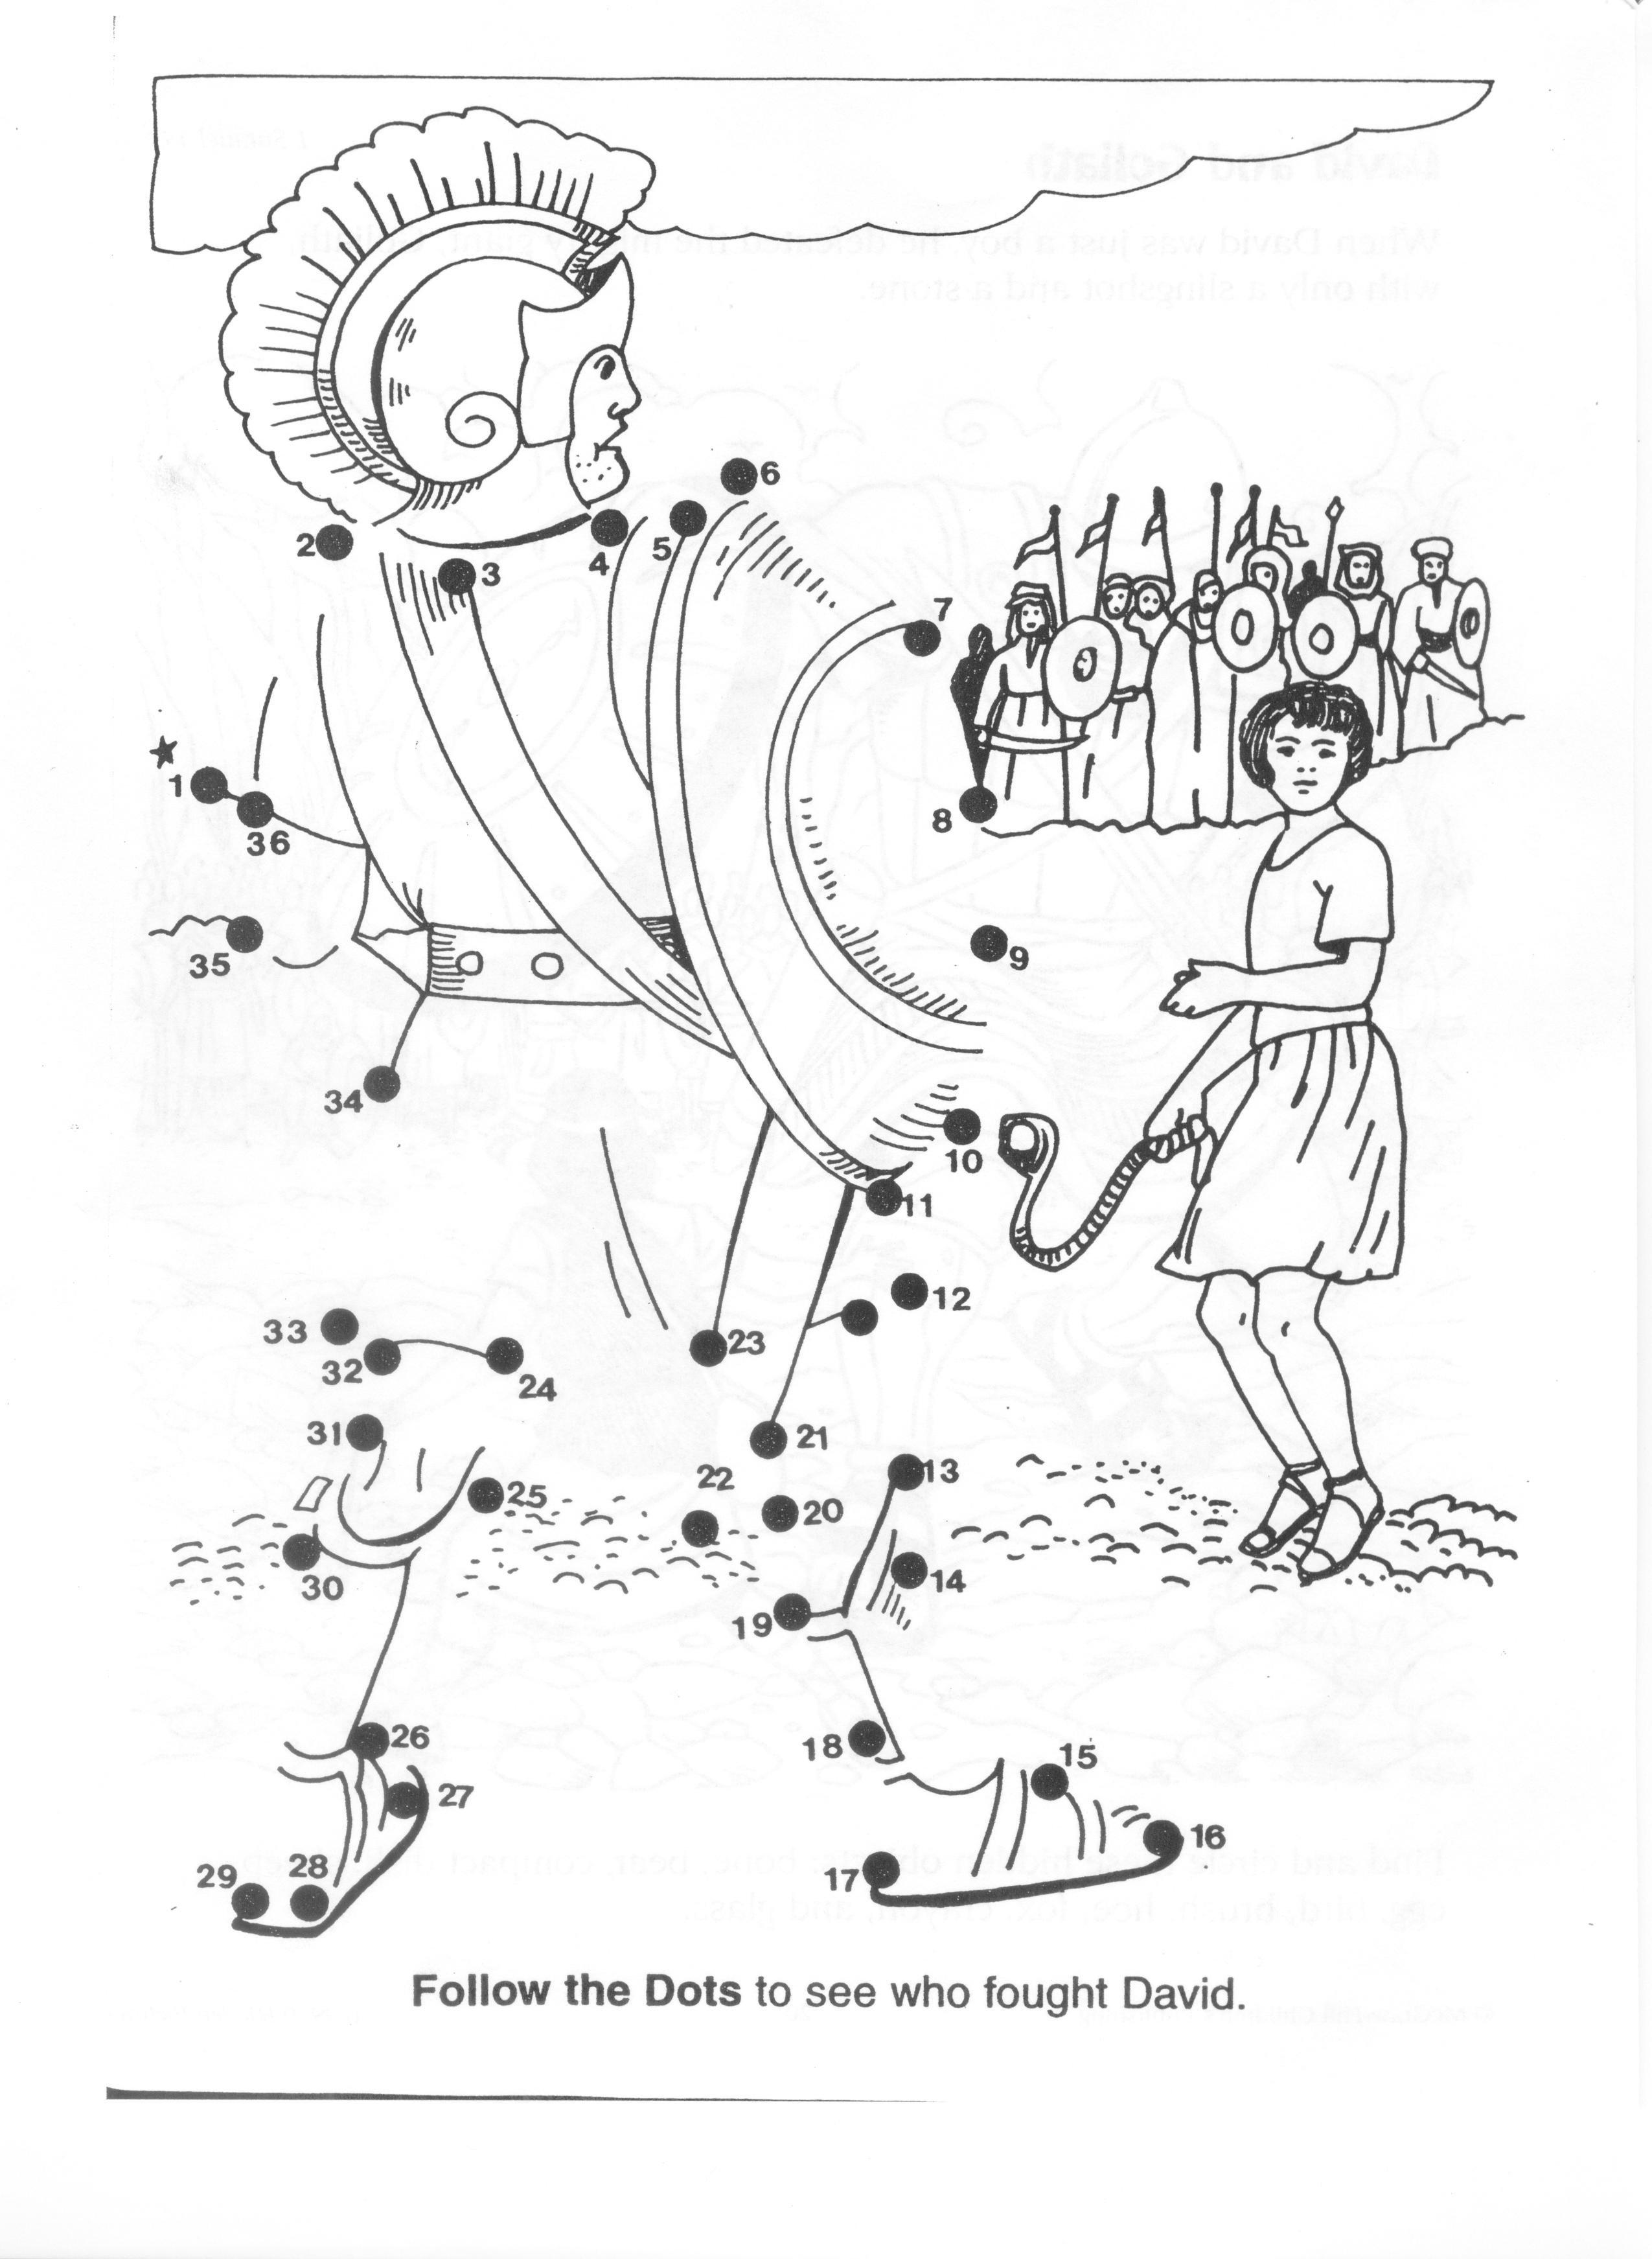 David And Goliath Worksheets  Yooob Pertaining To David And Goliath Worksheets